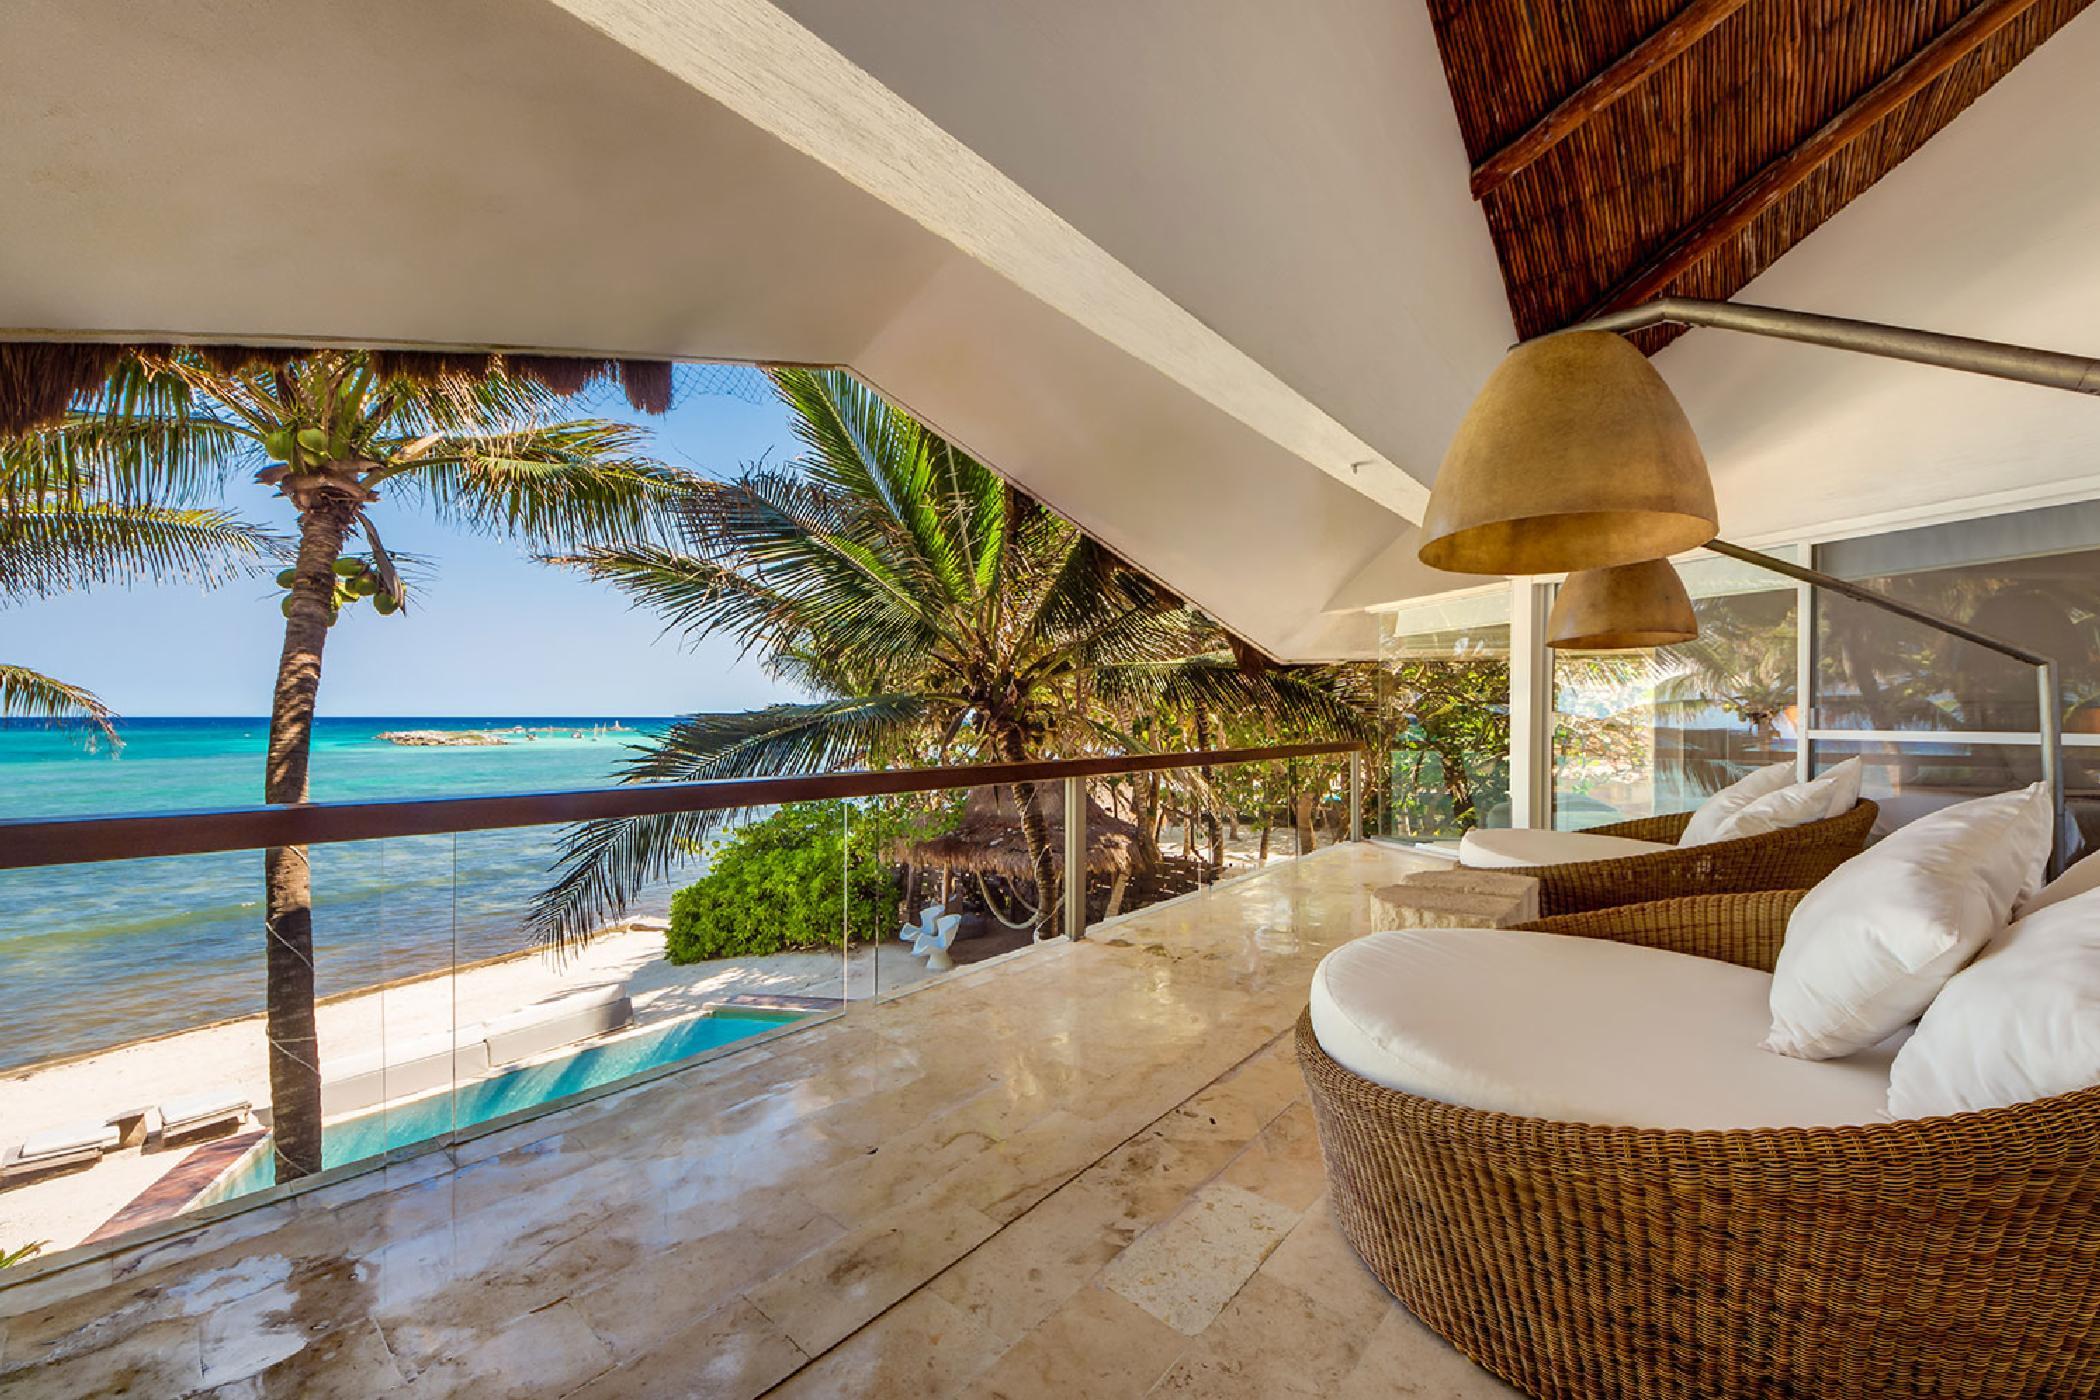 Maya_Luxe_Riviera_Maya_Luxury_Villas_Experiences_Puerto_Aventuras_5_Bedrooms_Zacil_Na_10.jpg